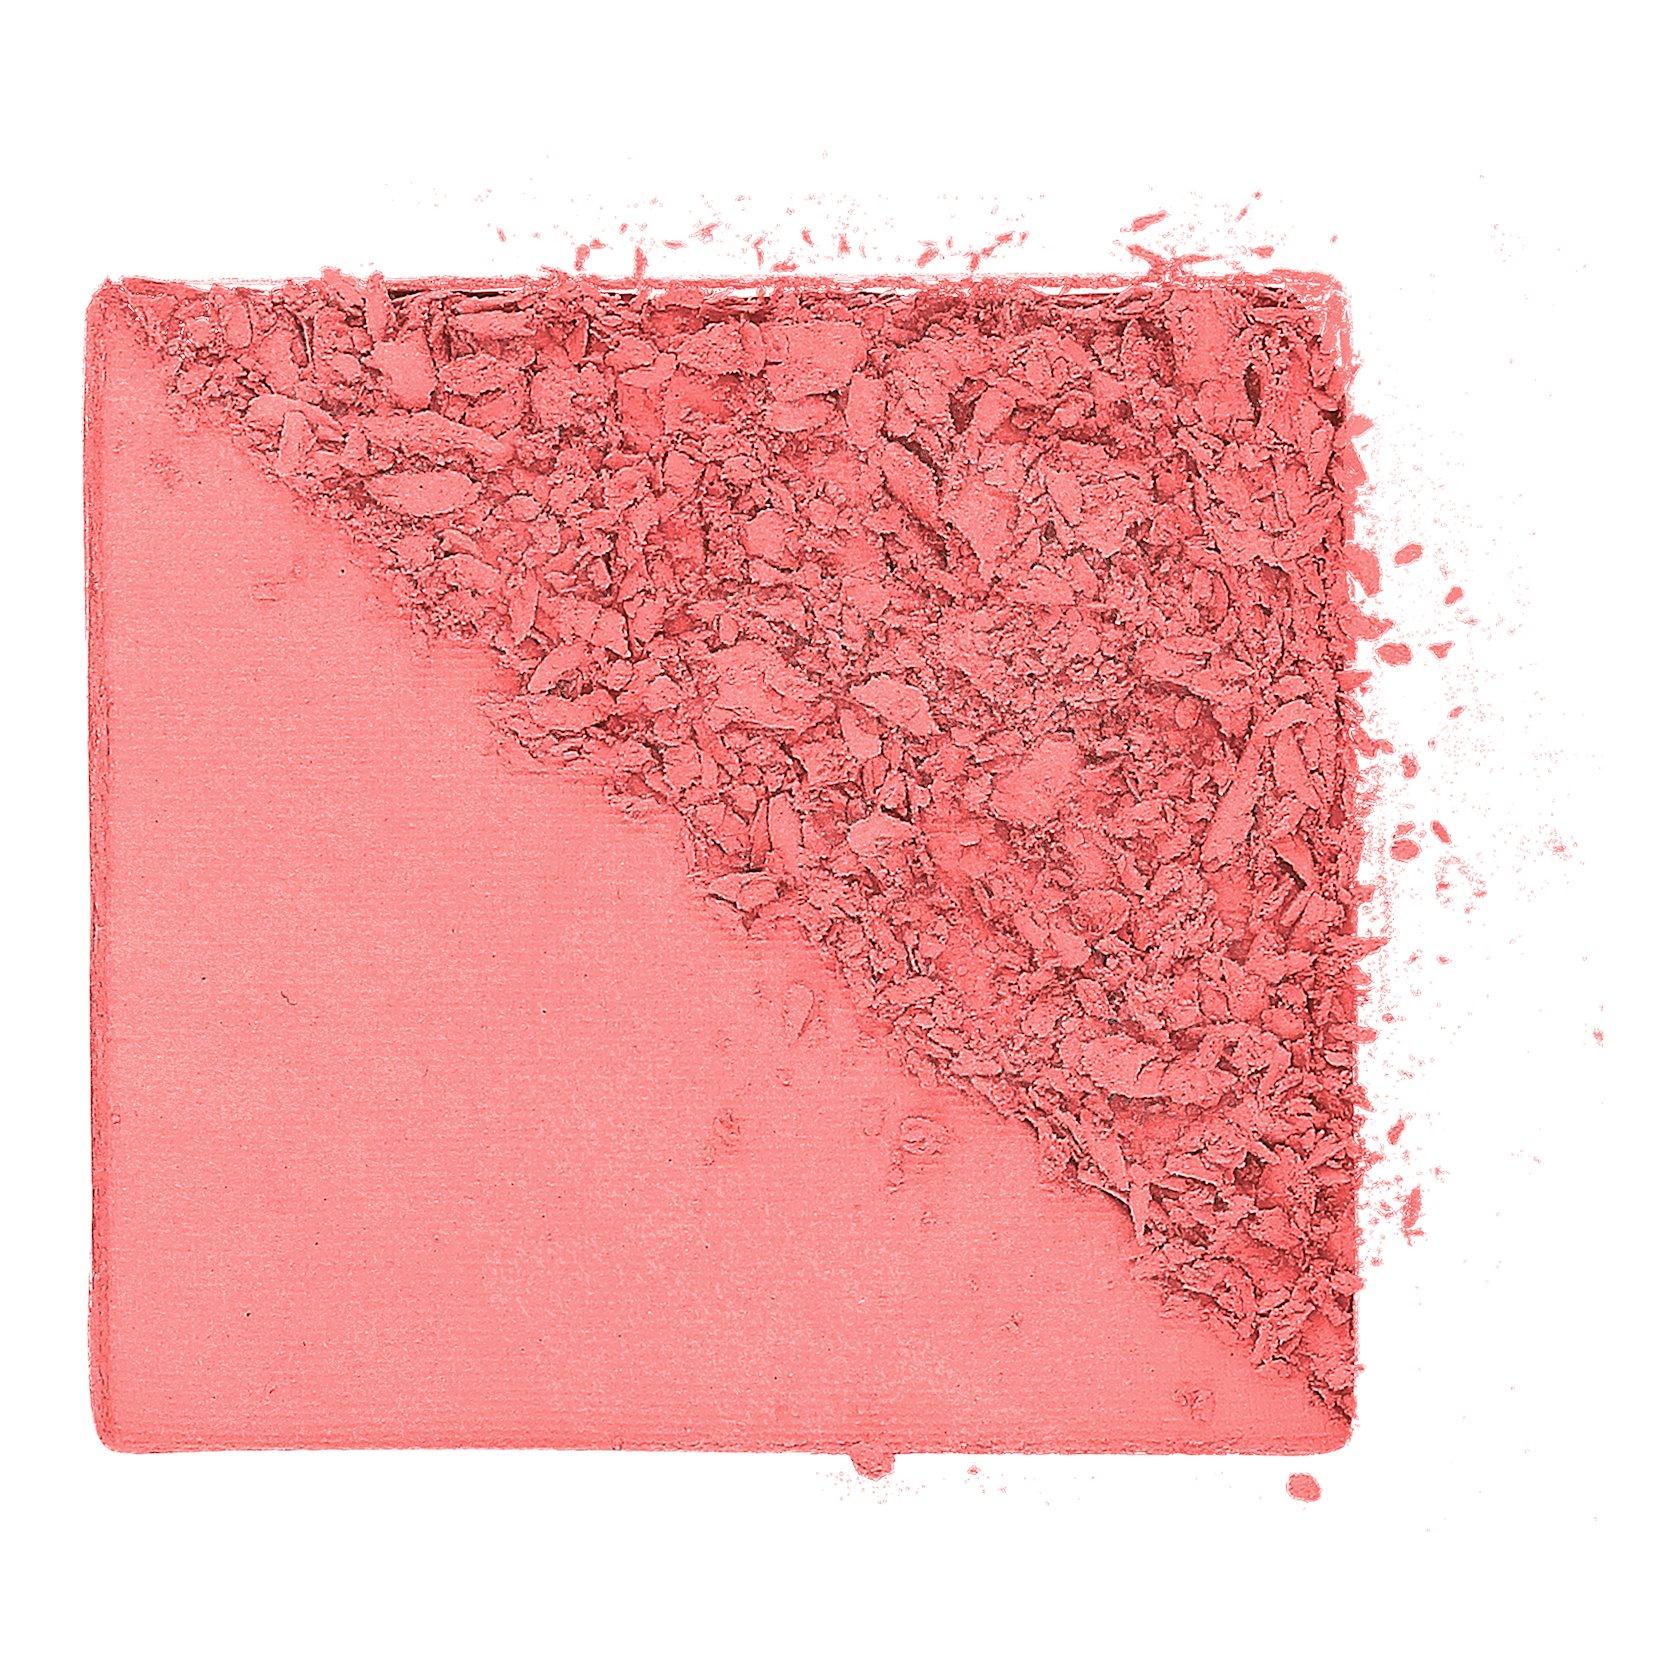 Ənlik Maybelline New York Fit Me Blush #35 Coral